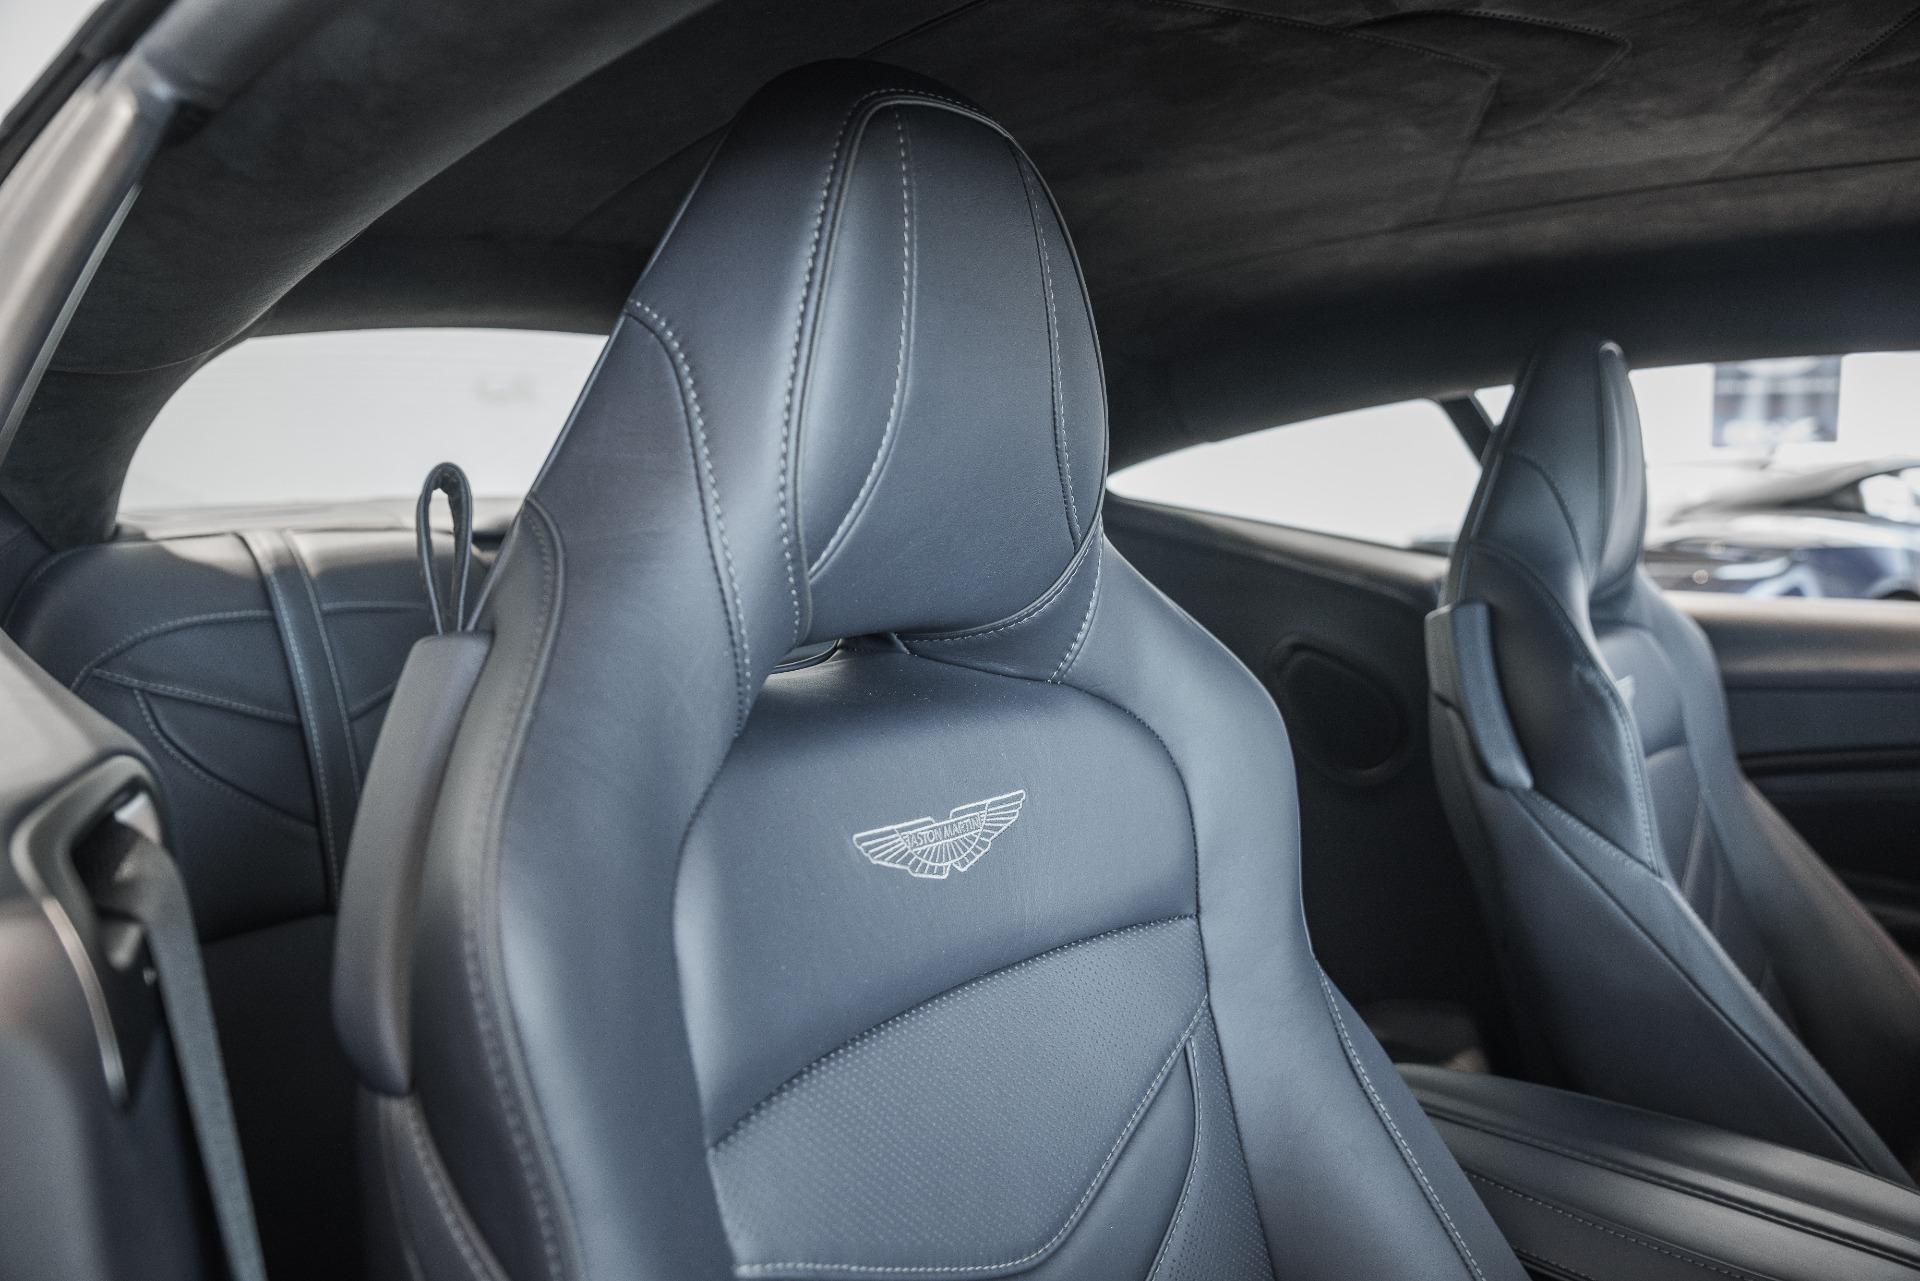 New-2020-Aston-Martin-DBS-Superleggera